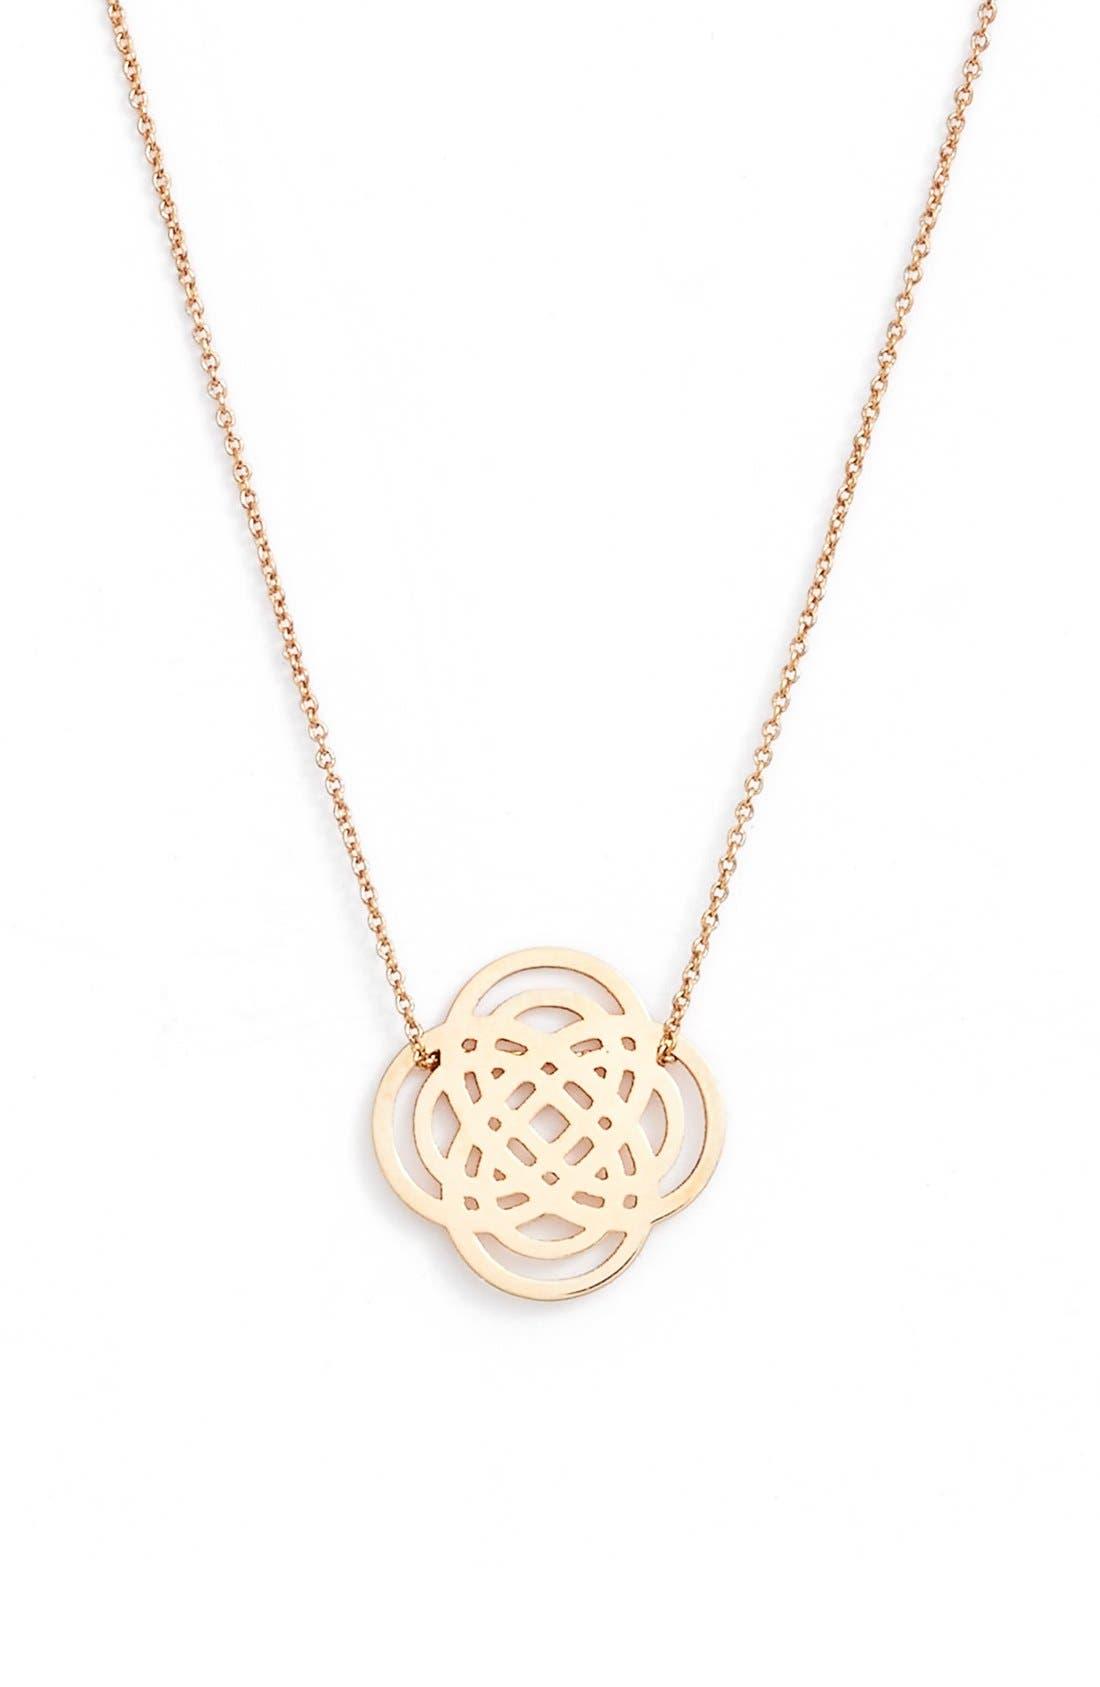 Main Image - ginette ny Mini Purity Pendant Necklace